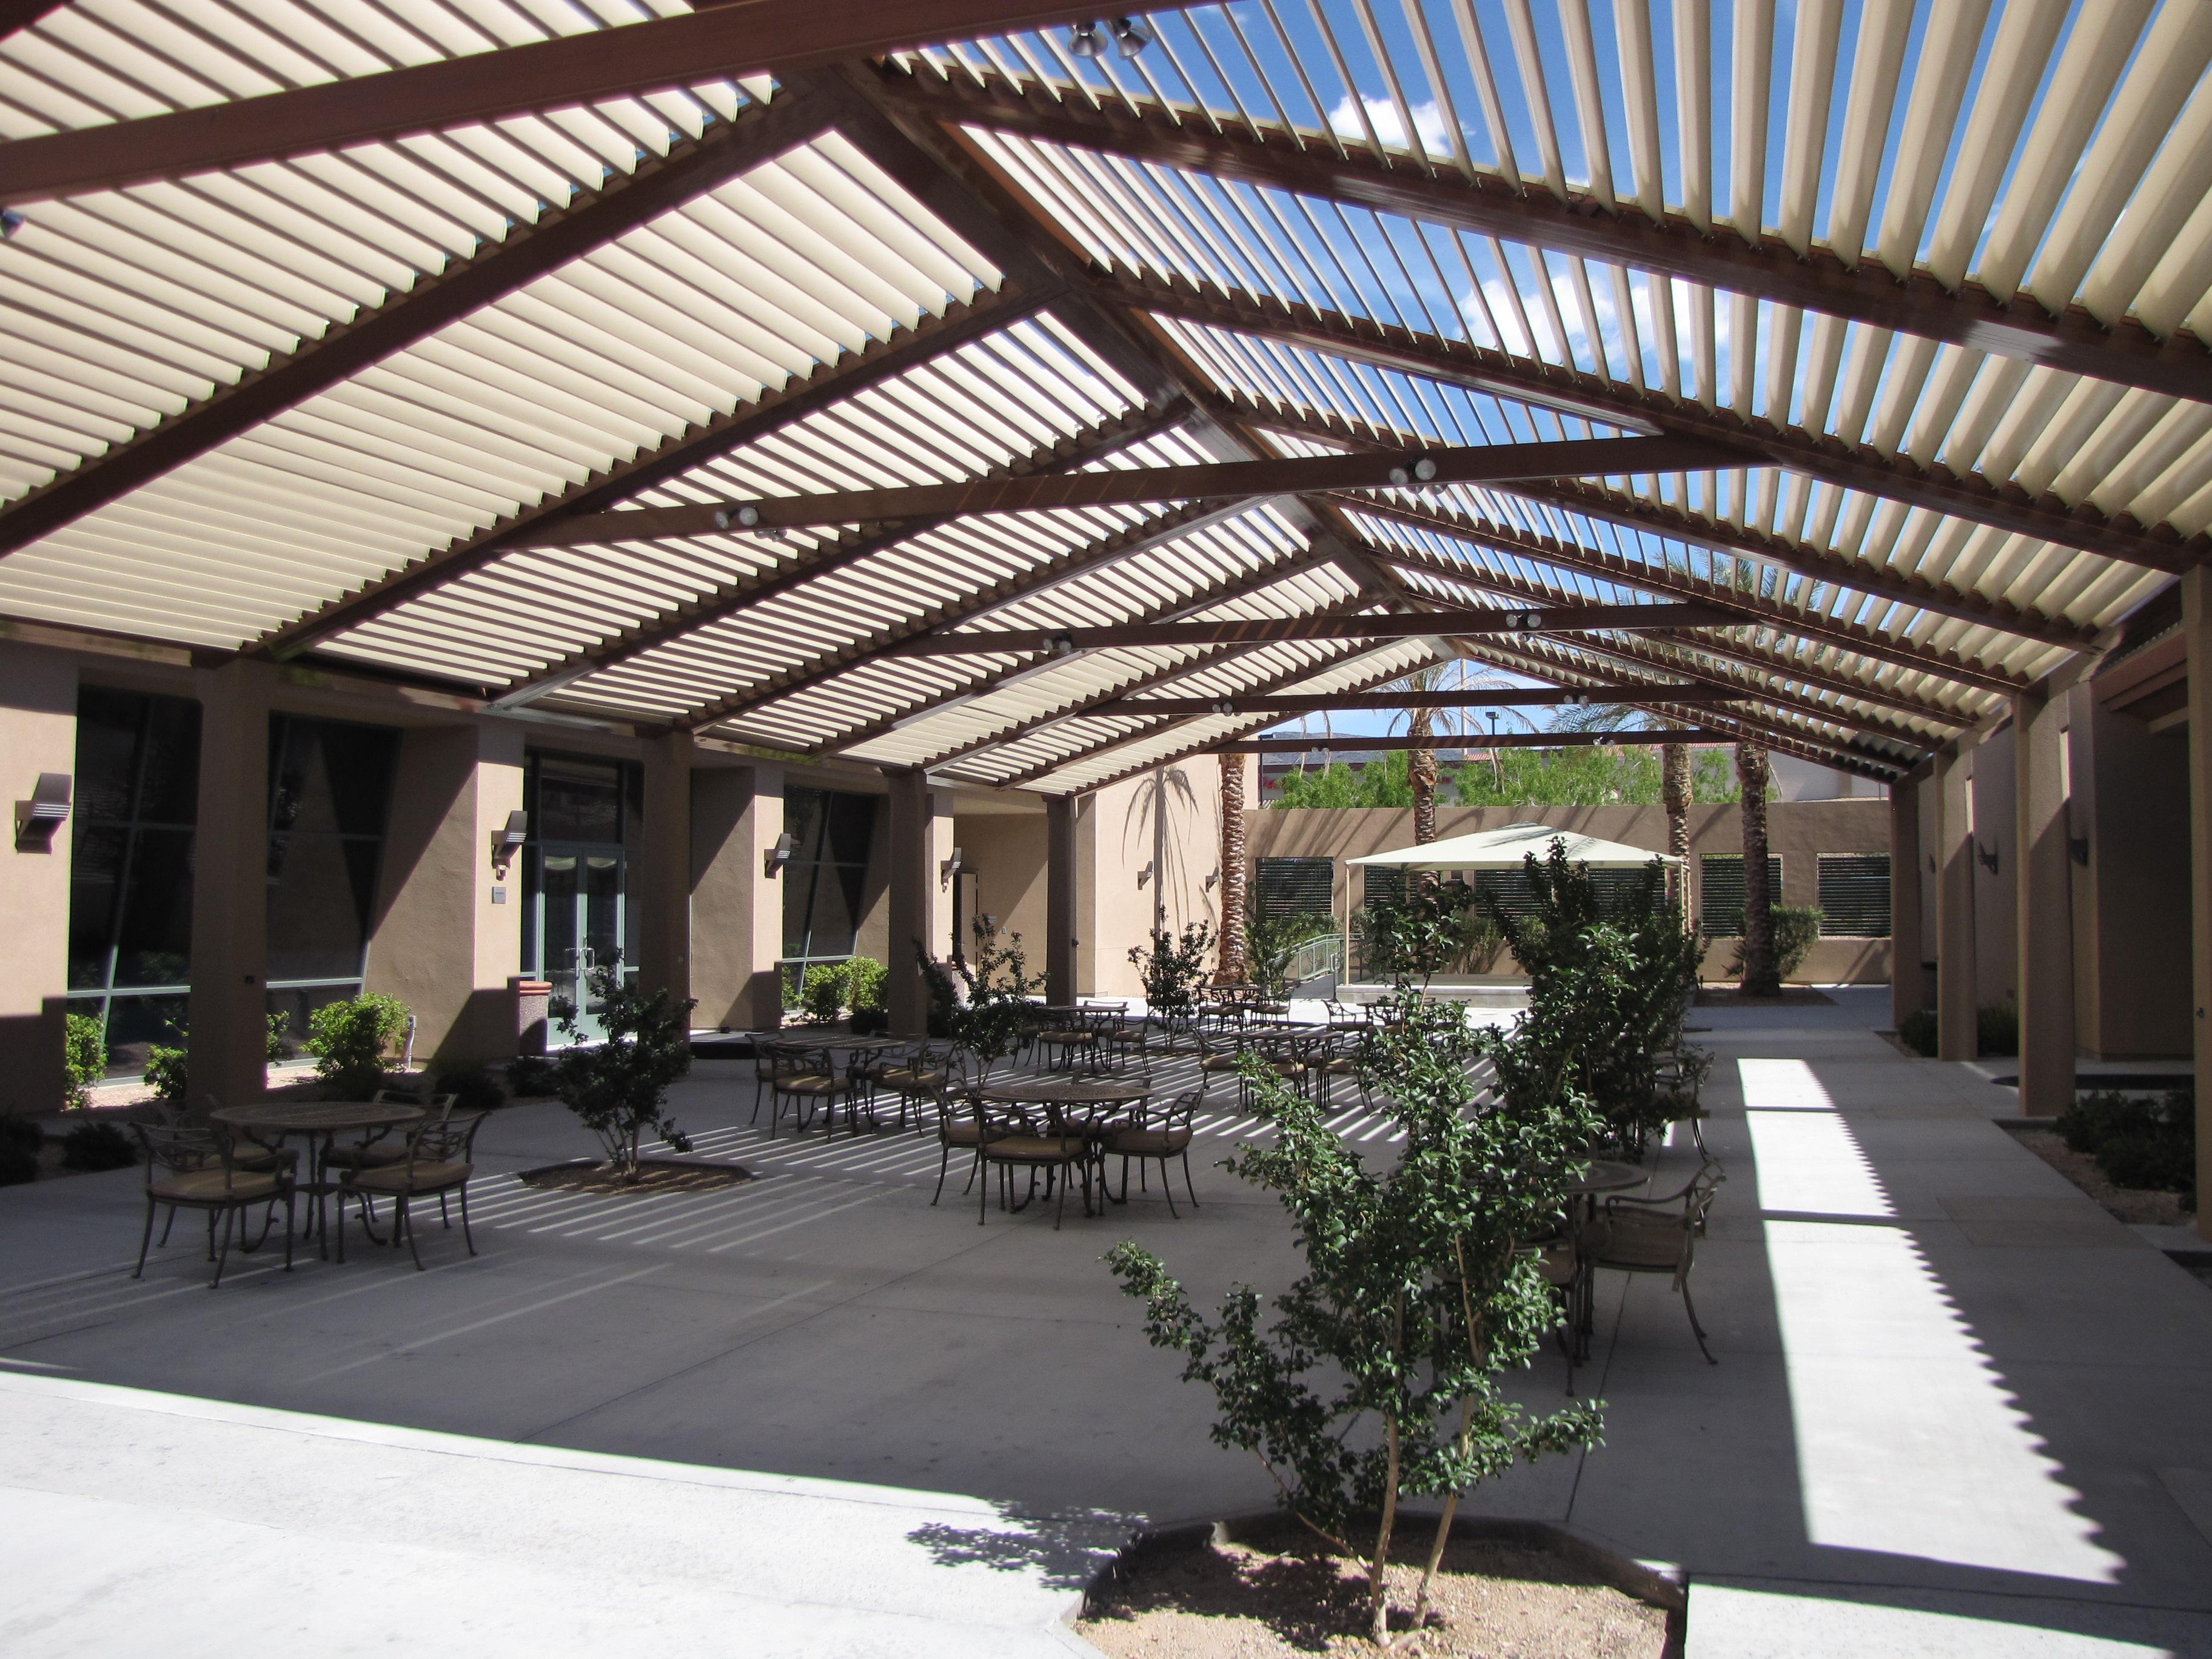 Courtyard [directional shade]